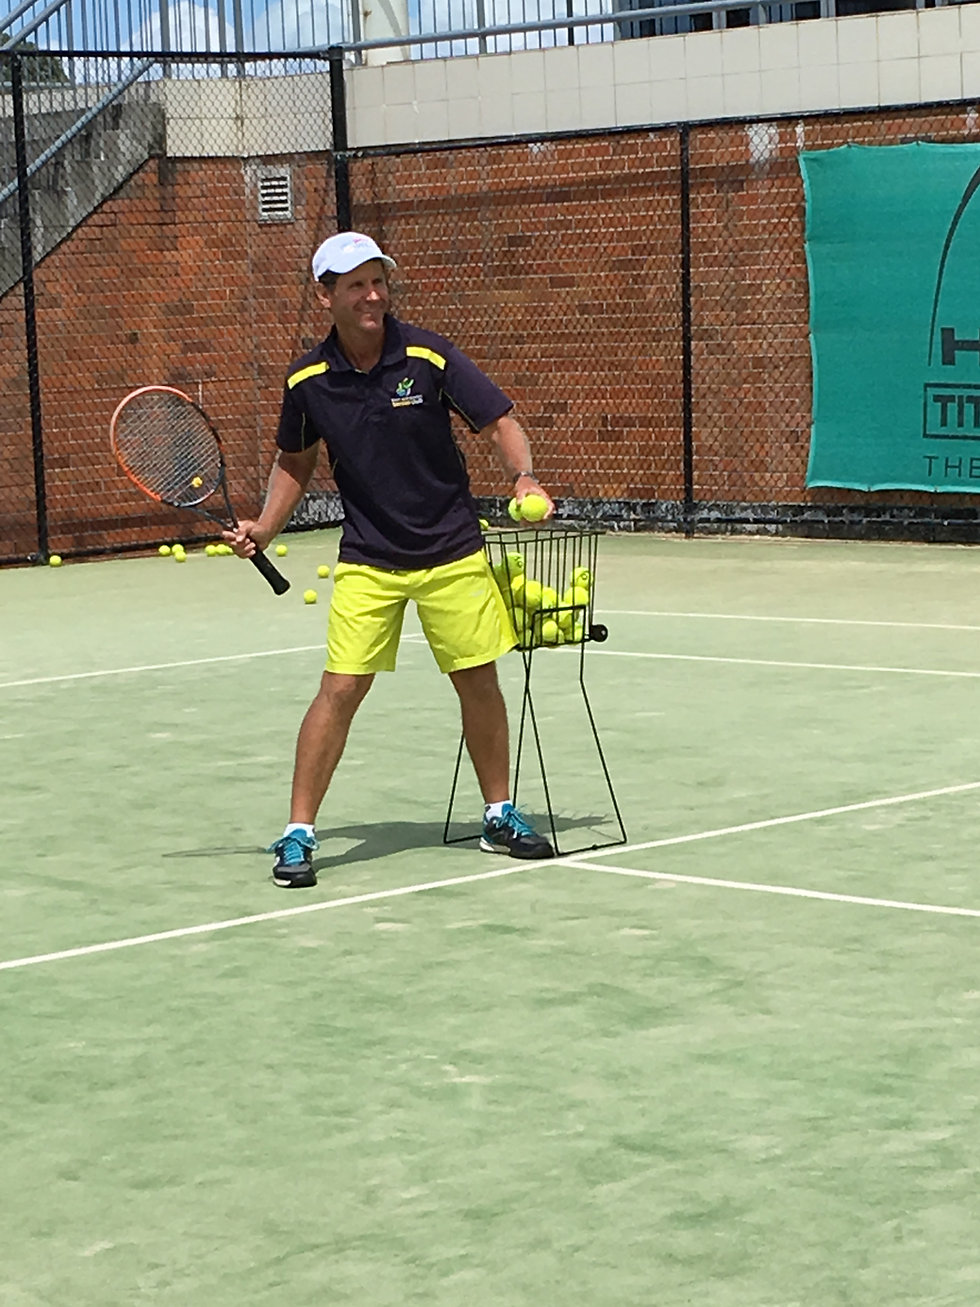 Greg Alchin Port Macqurie Tennic Club Coach